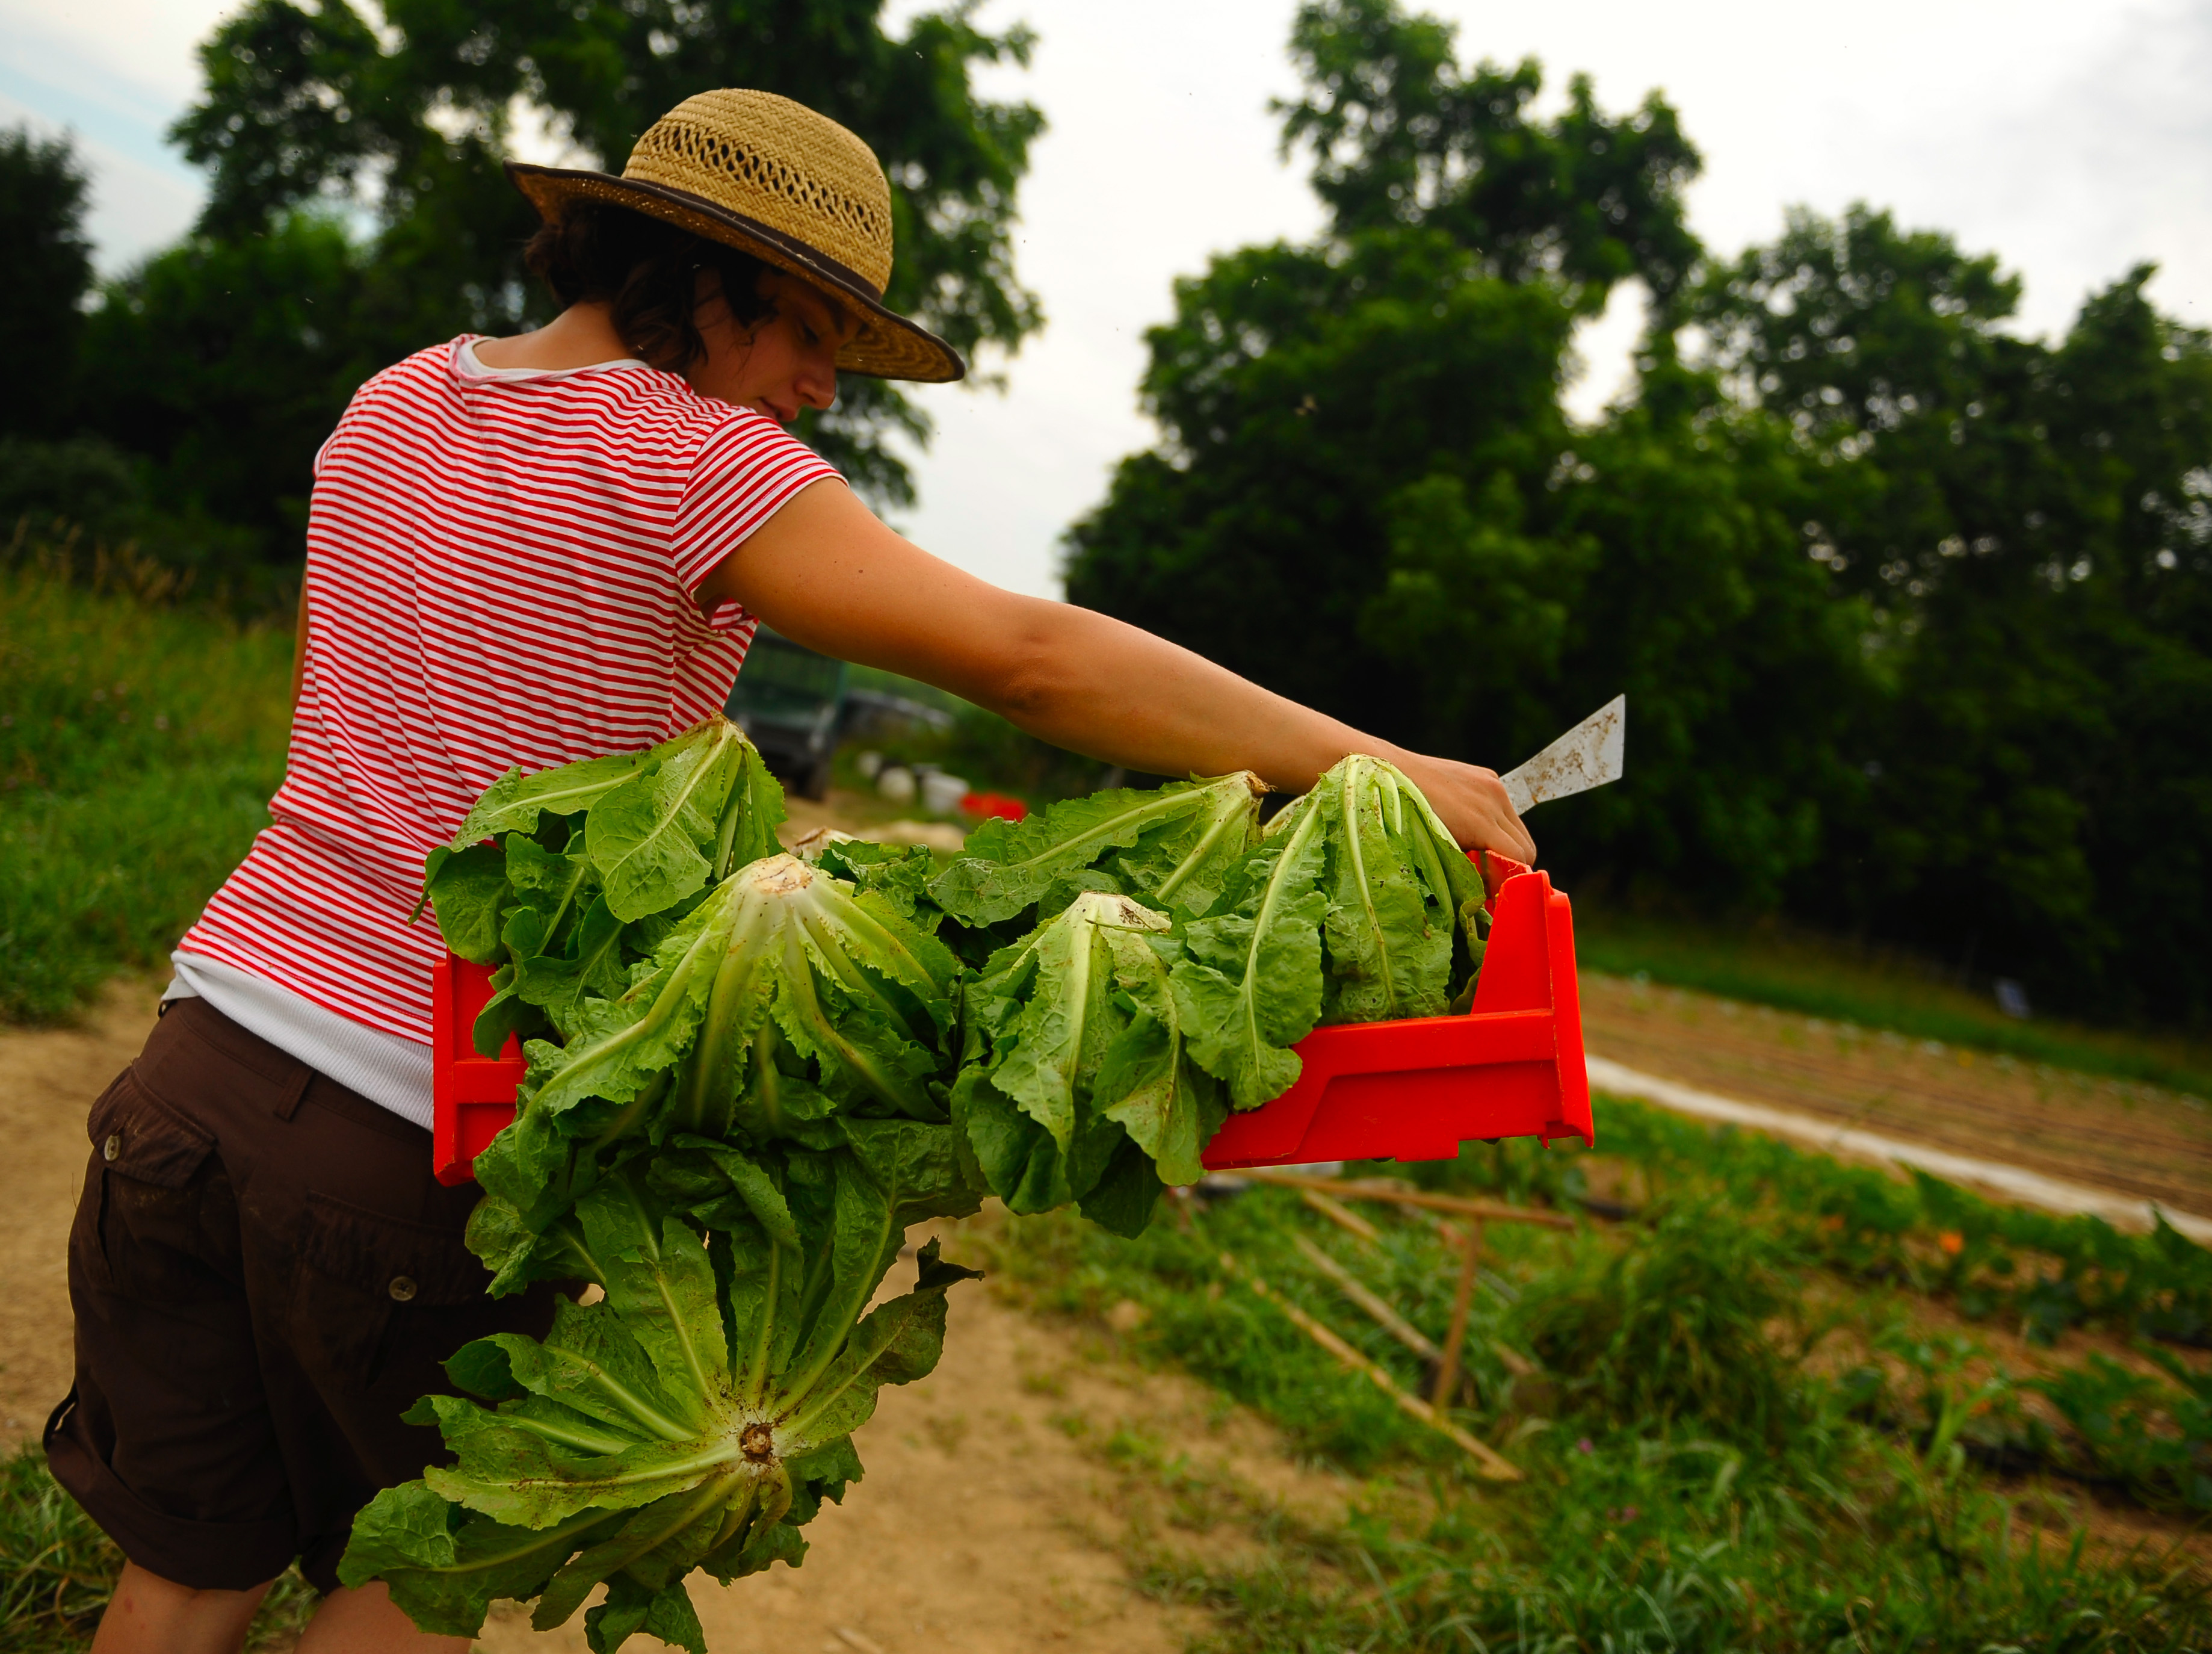 A woman farmer carries a bushel of romaine lettuce heads.